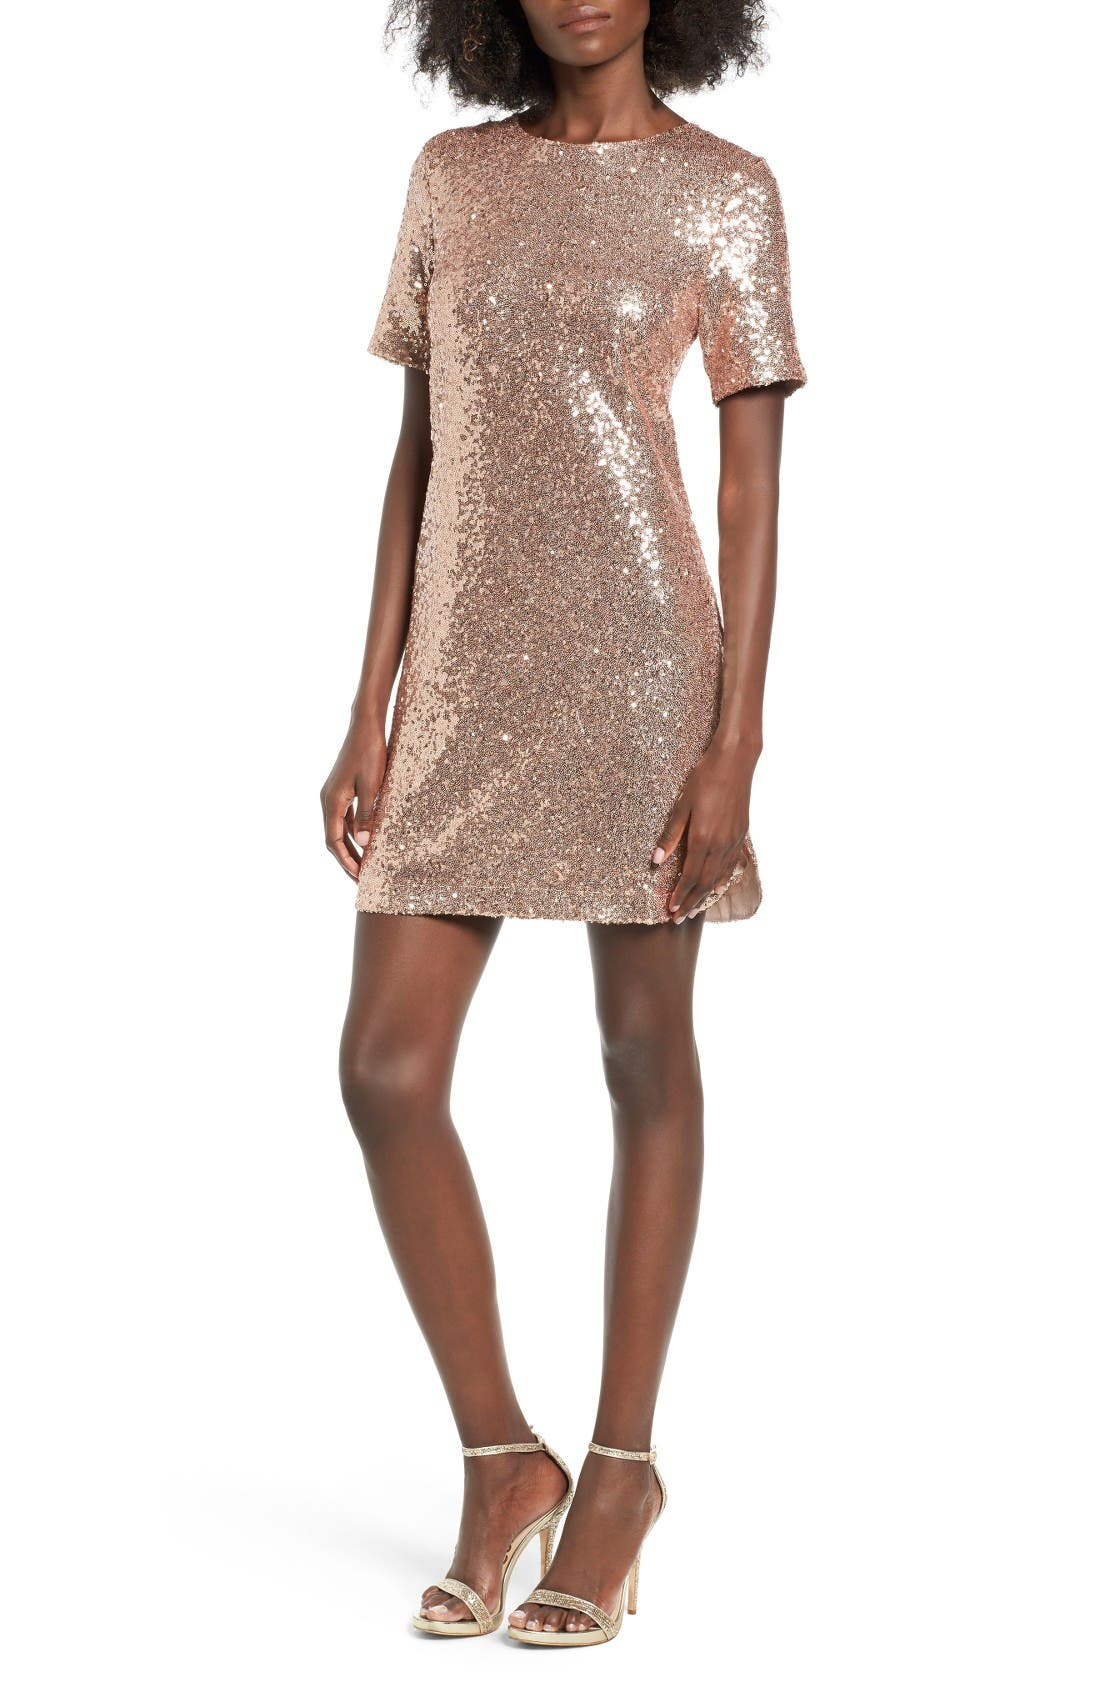 Alternate Image 1 Selected - Soprano Sequin T-Shirt Dress